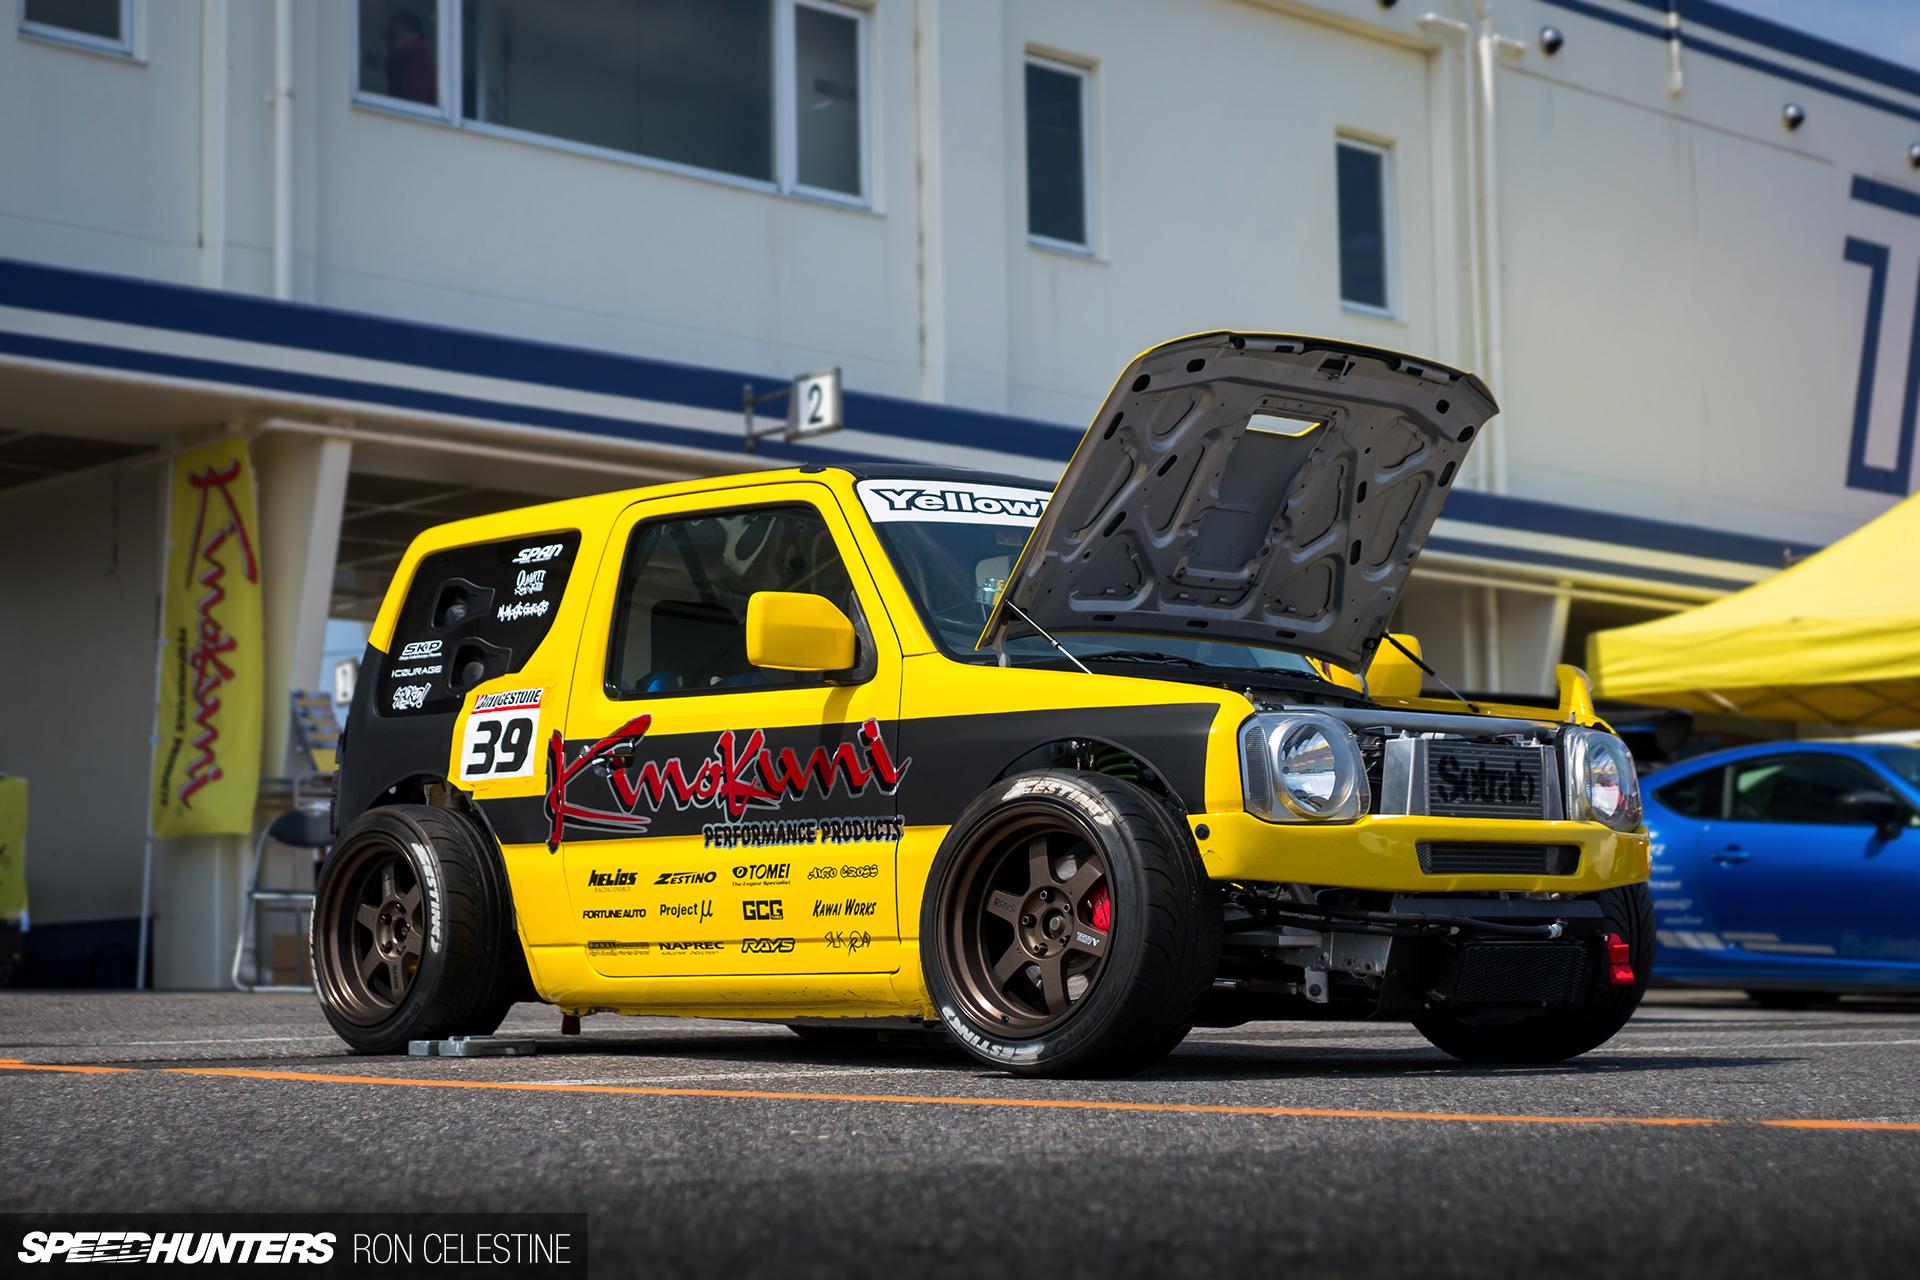 Yellow Bullet 2 The Timeattacking Suzuki Jimny